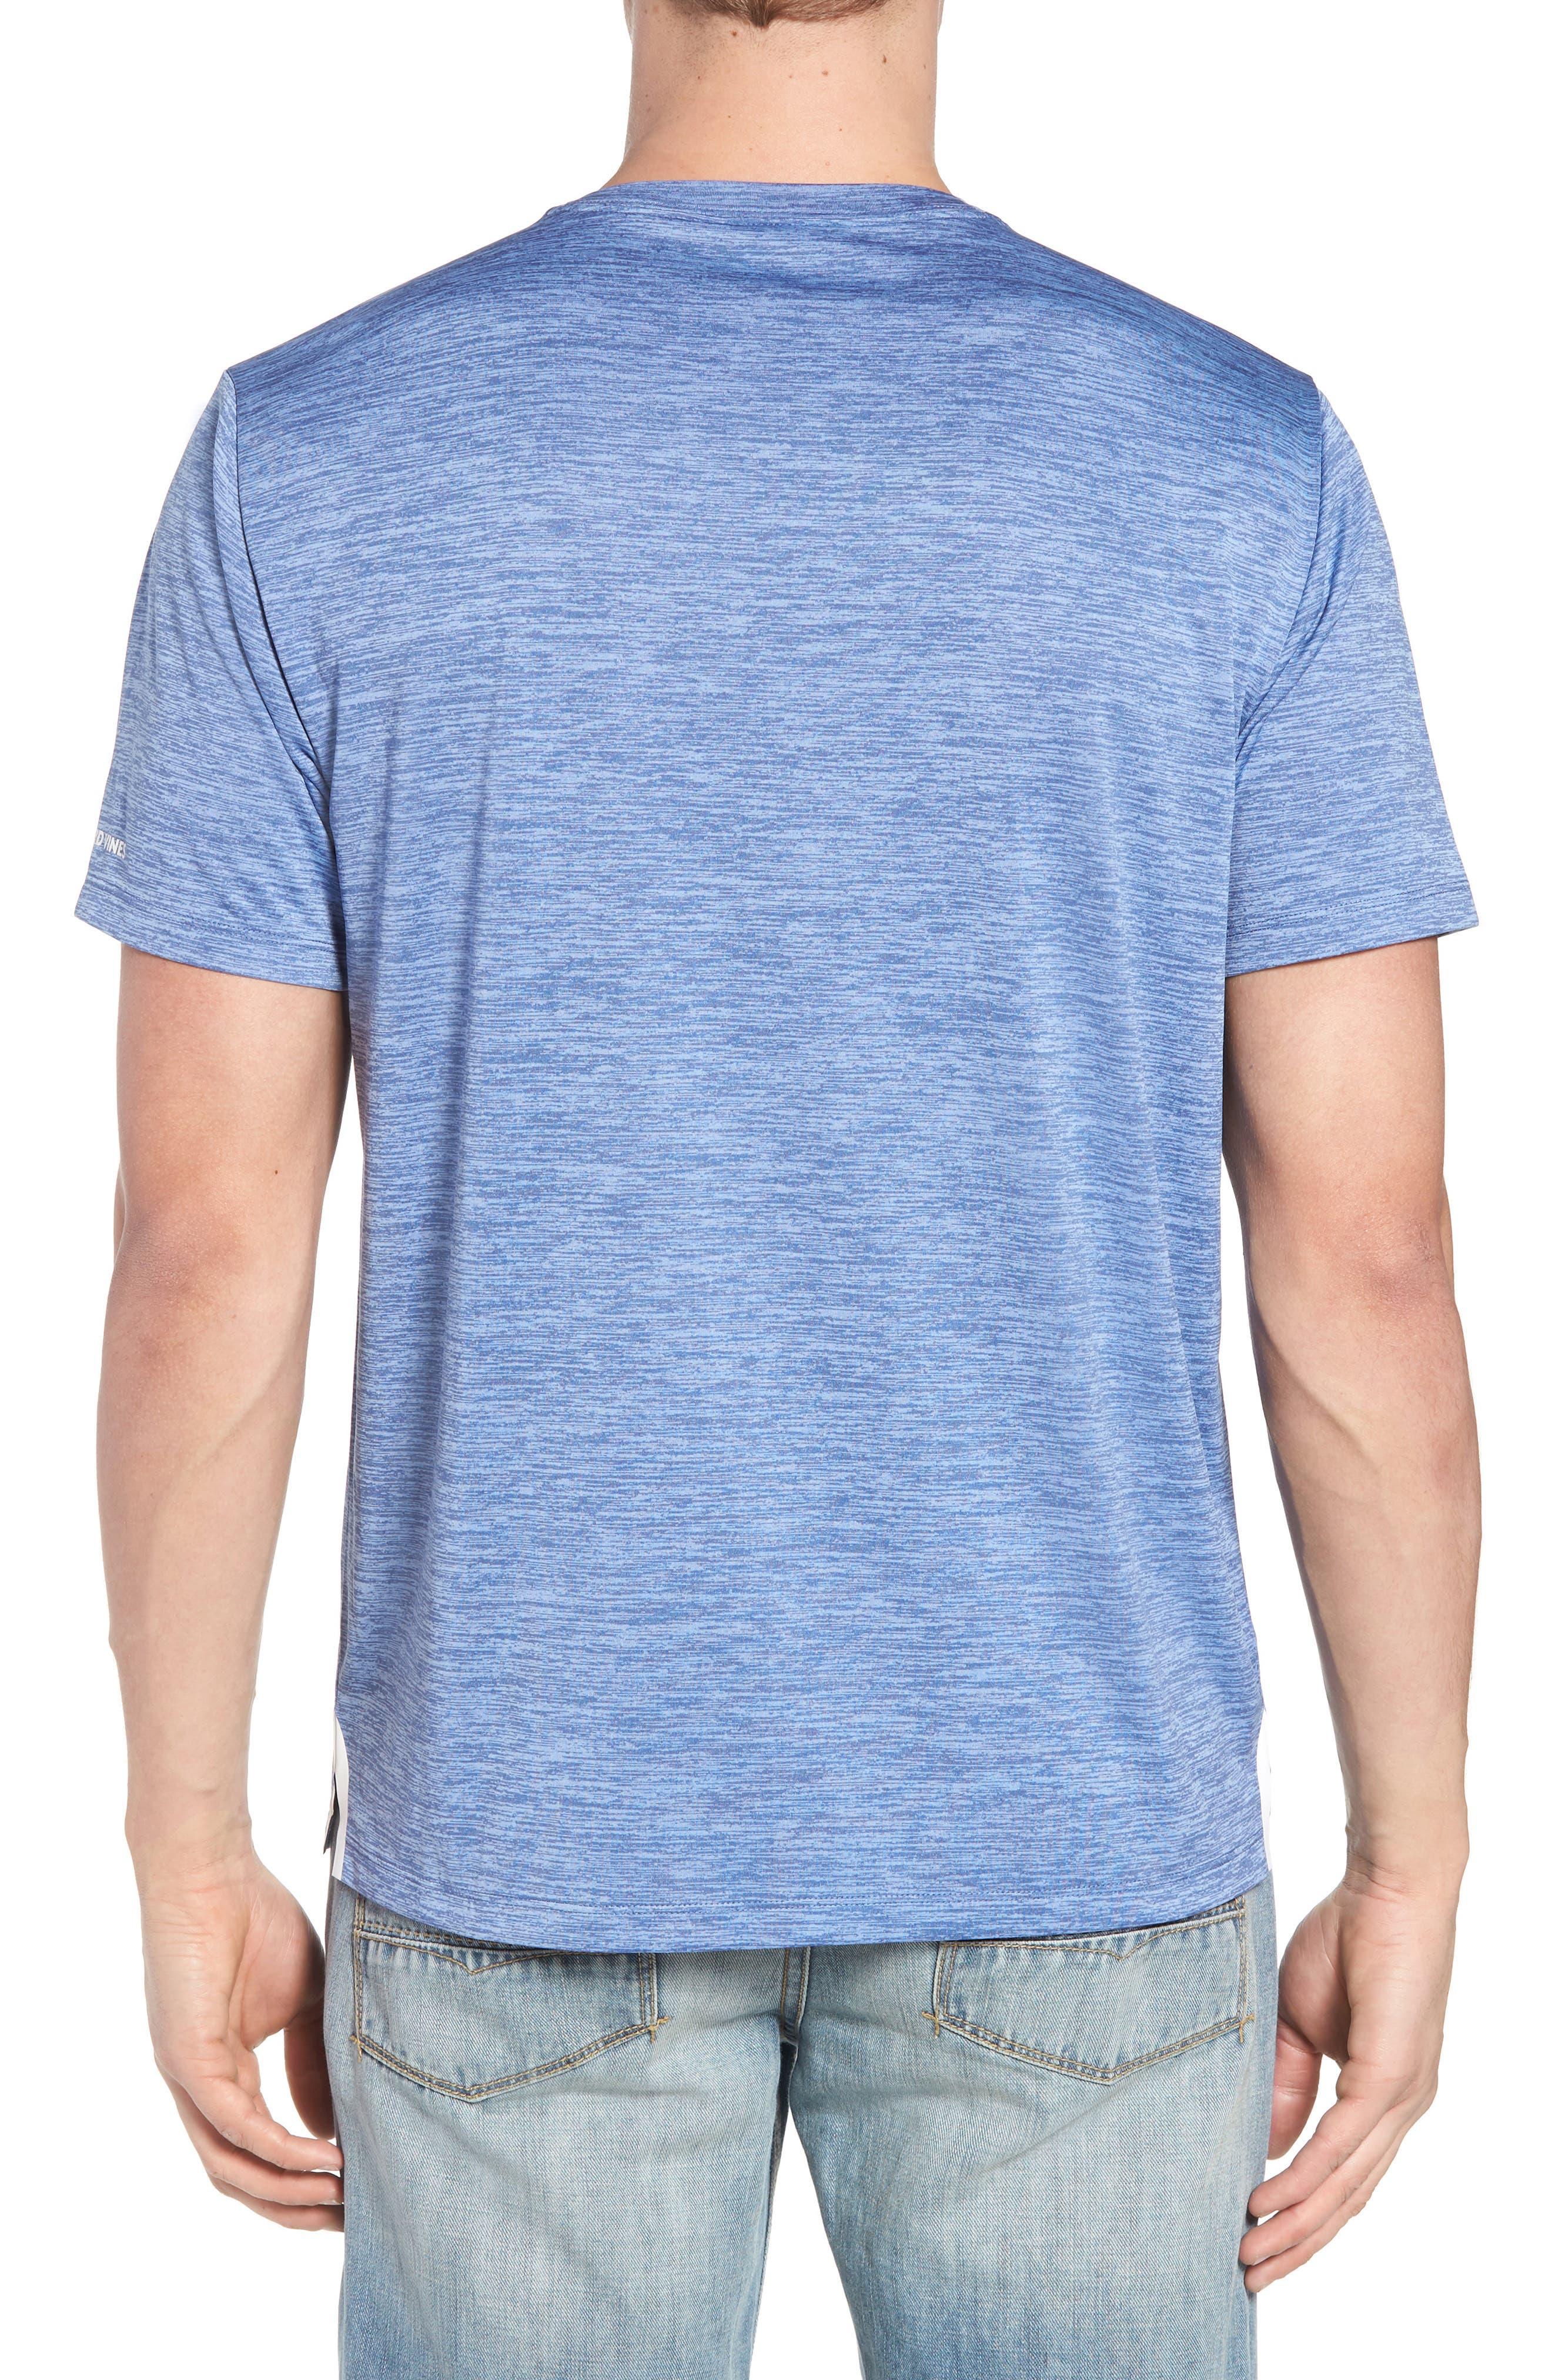 Space Dye Crewneck Performance T-Shirt,                             Alternate thumbnail 2, color,                             400